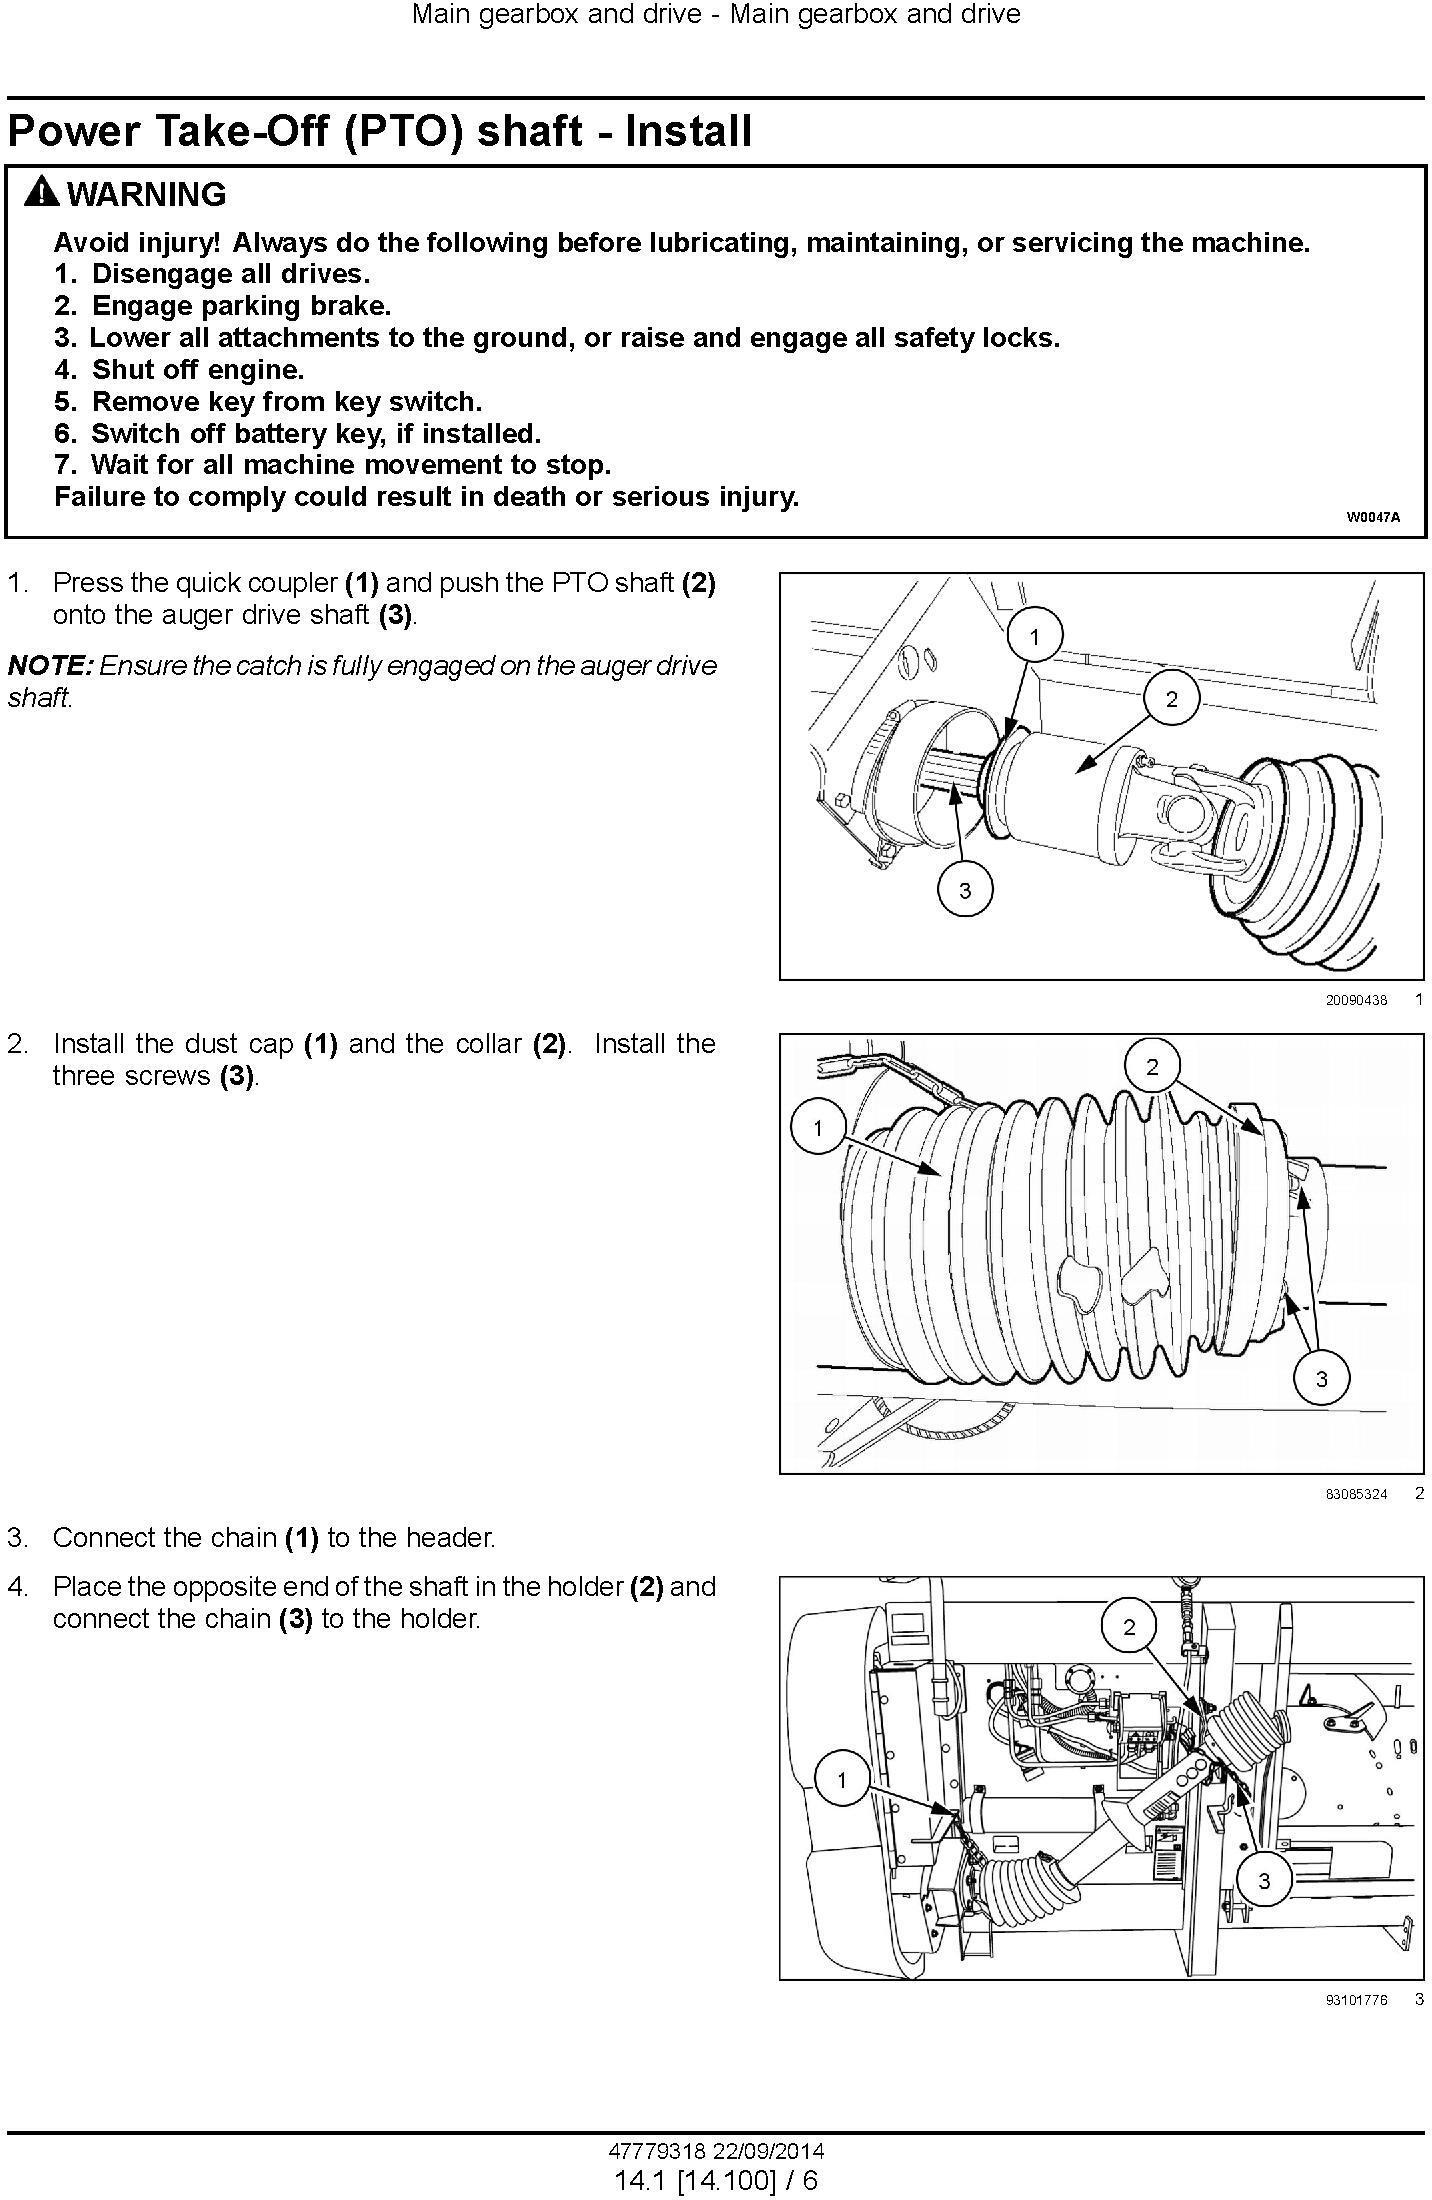 New Holland 790CP Pick-up Header Service Manual - 2